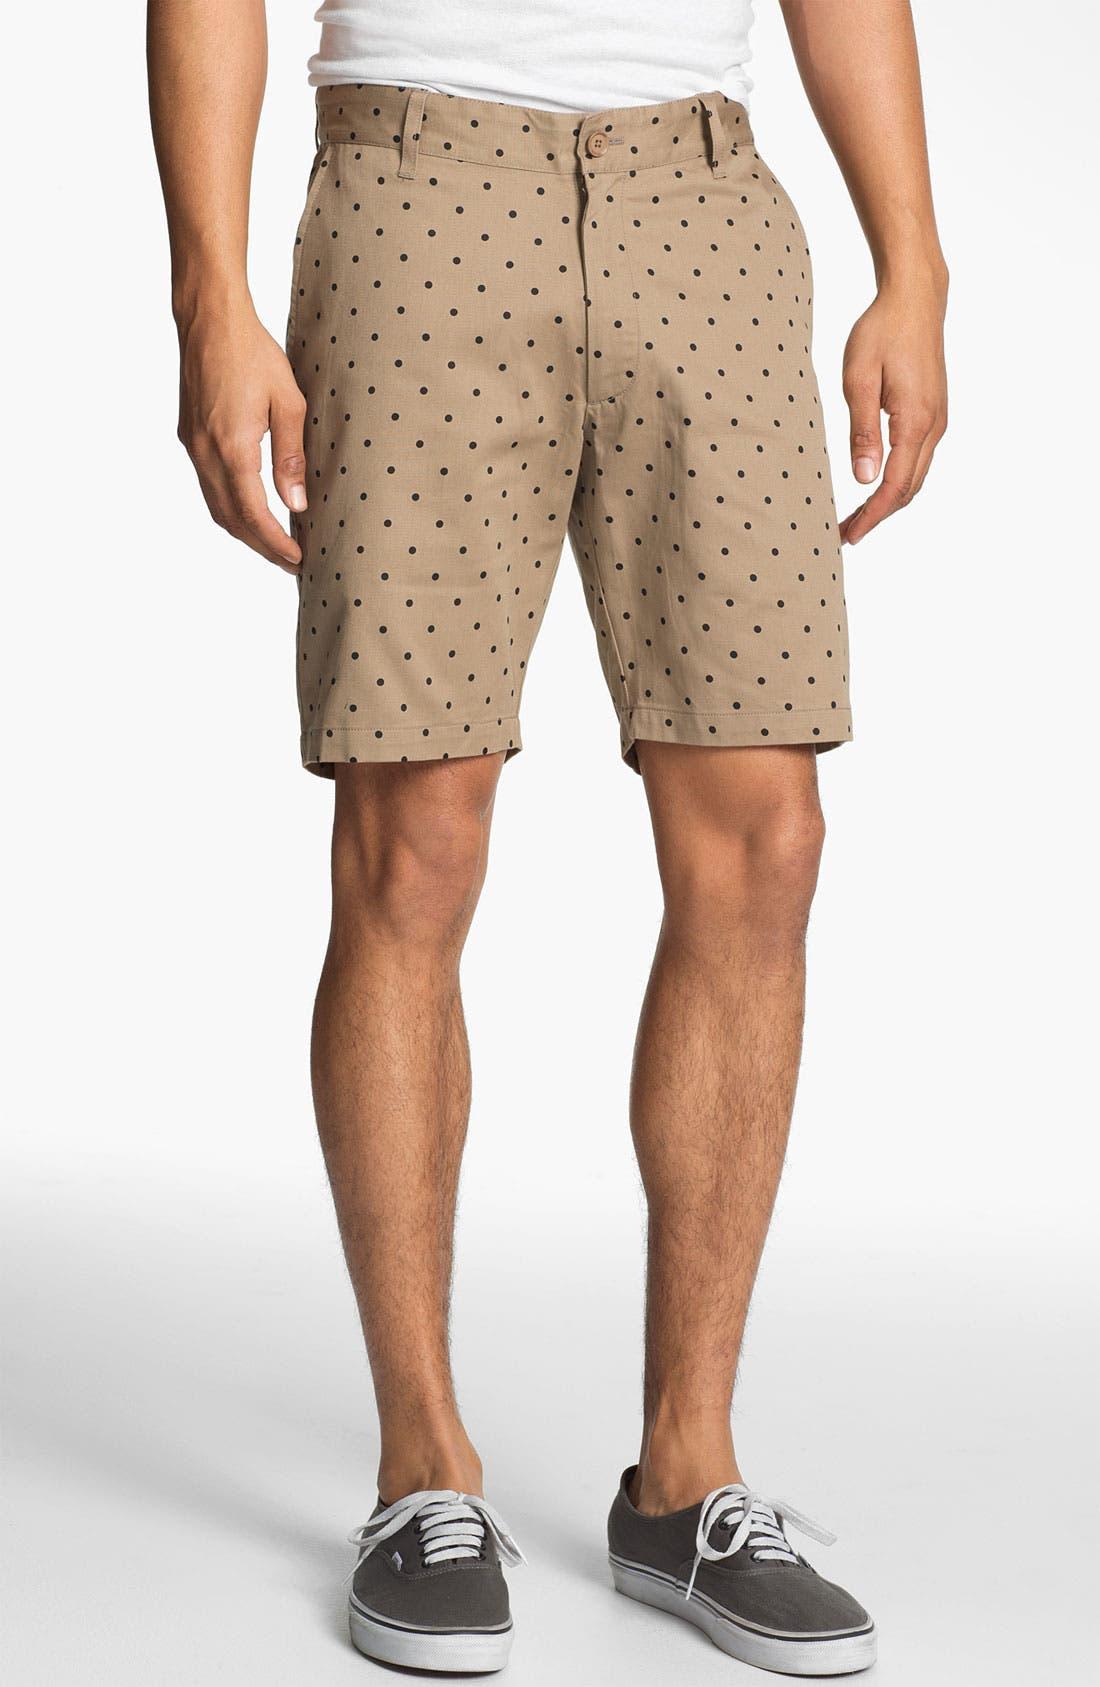 Main Image - Stussy Deluxe 'Gramps' Polka Dot Shorts